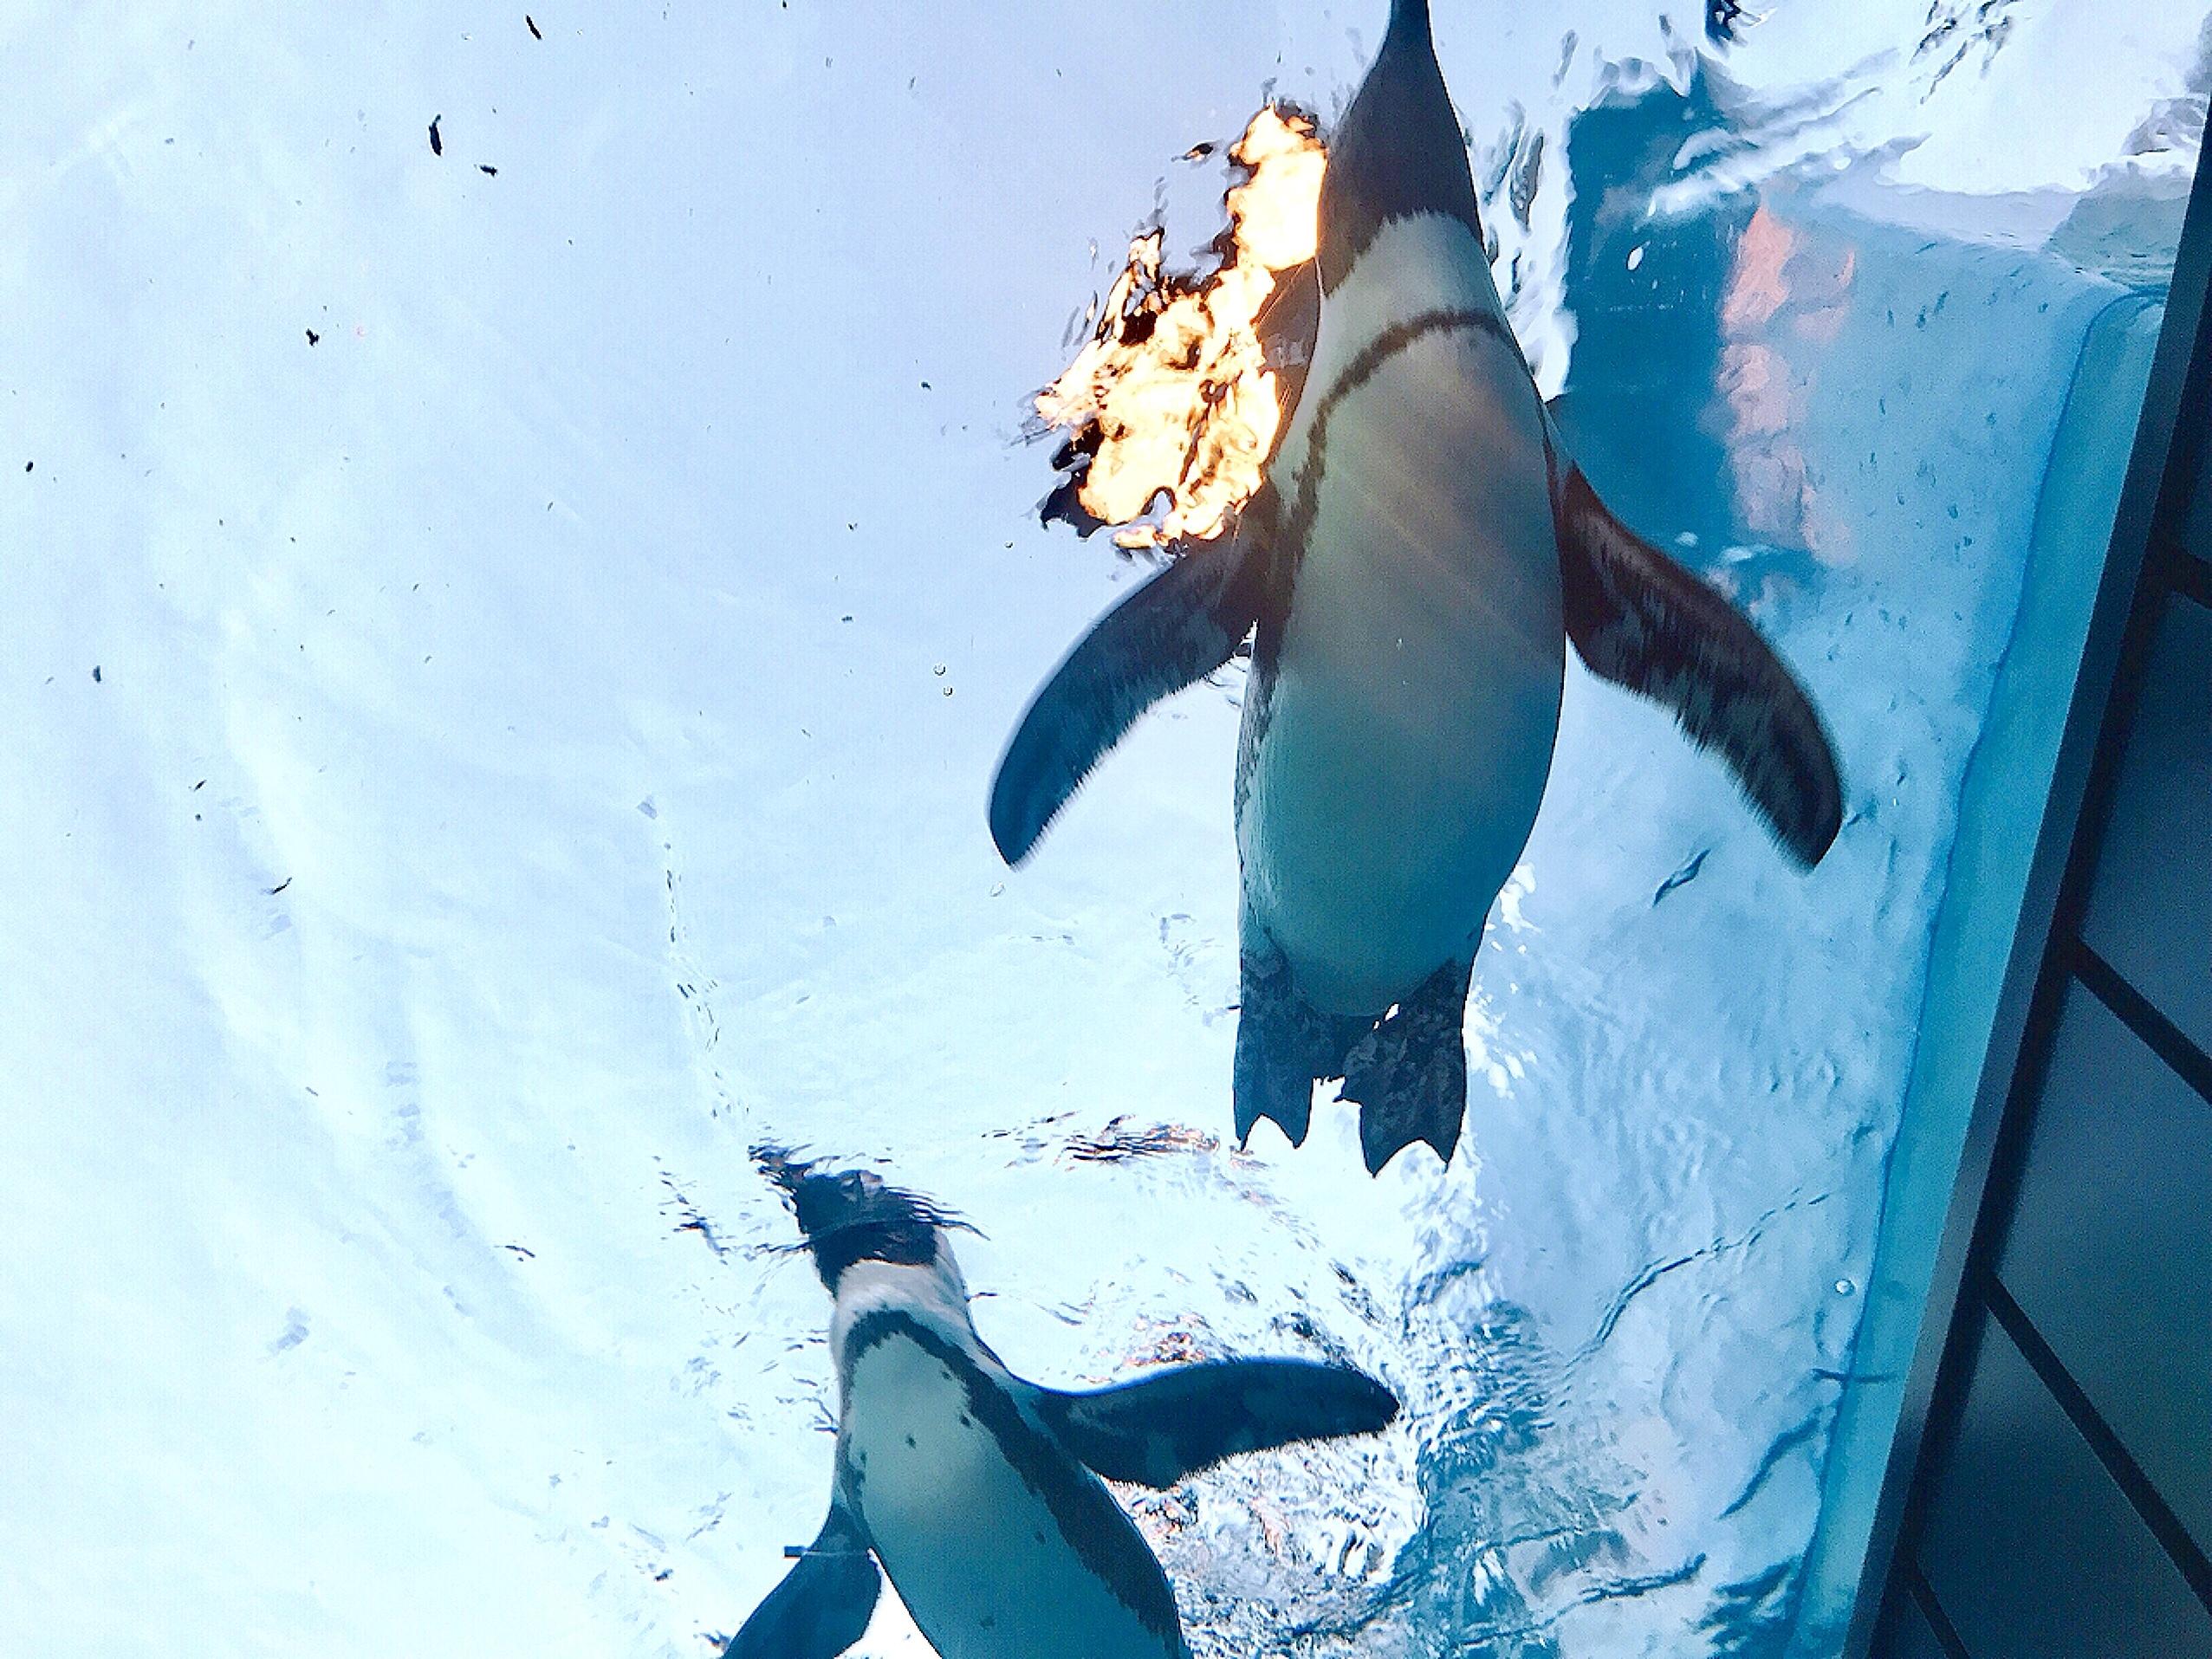 Vol.24♡ 世界初!空飛ぶペンギン?!【池袋・サンシャイン水族館】_1_4